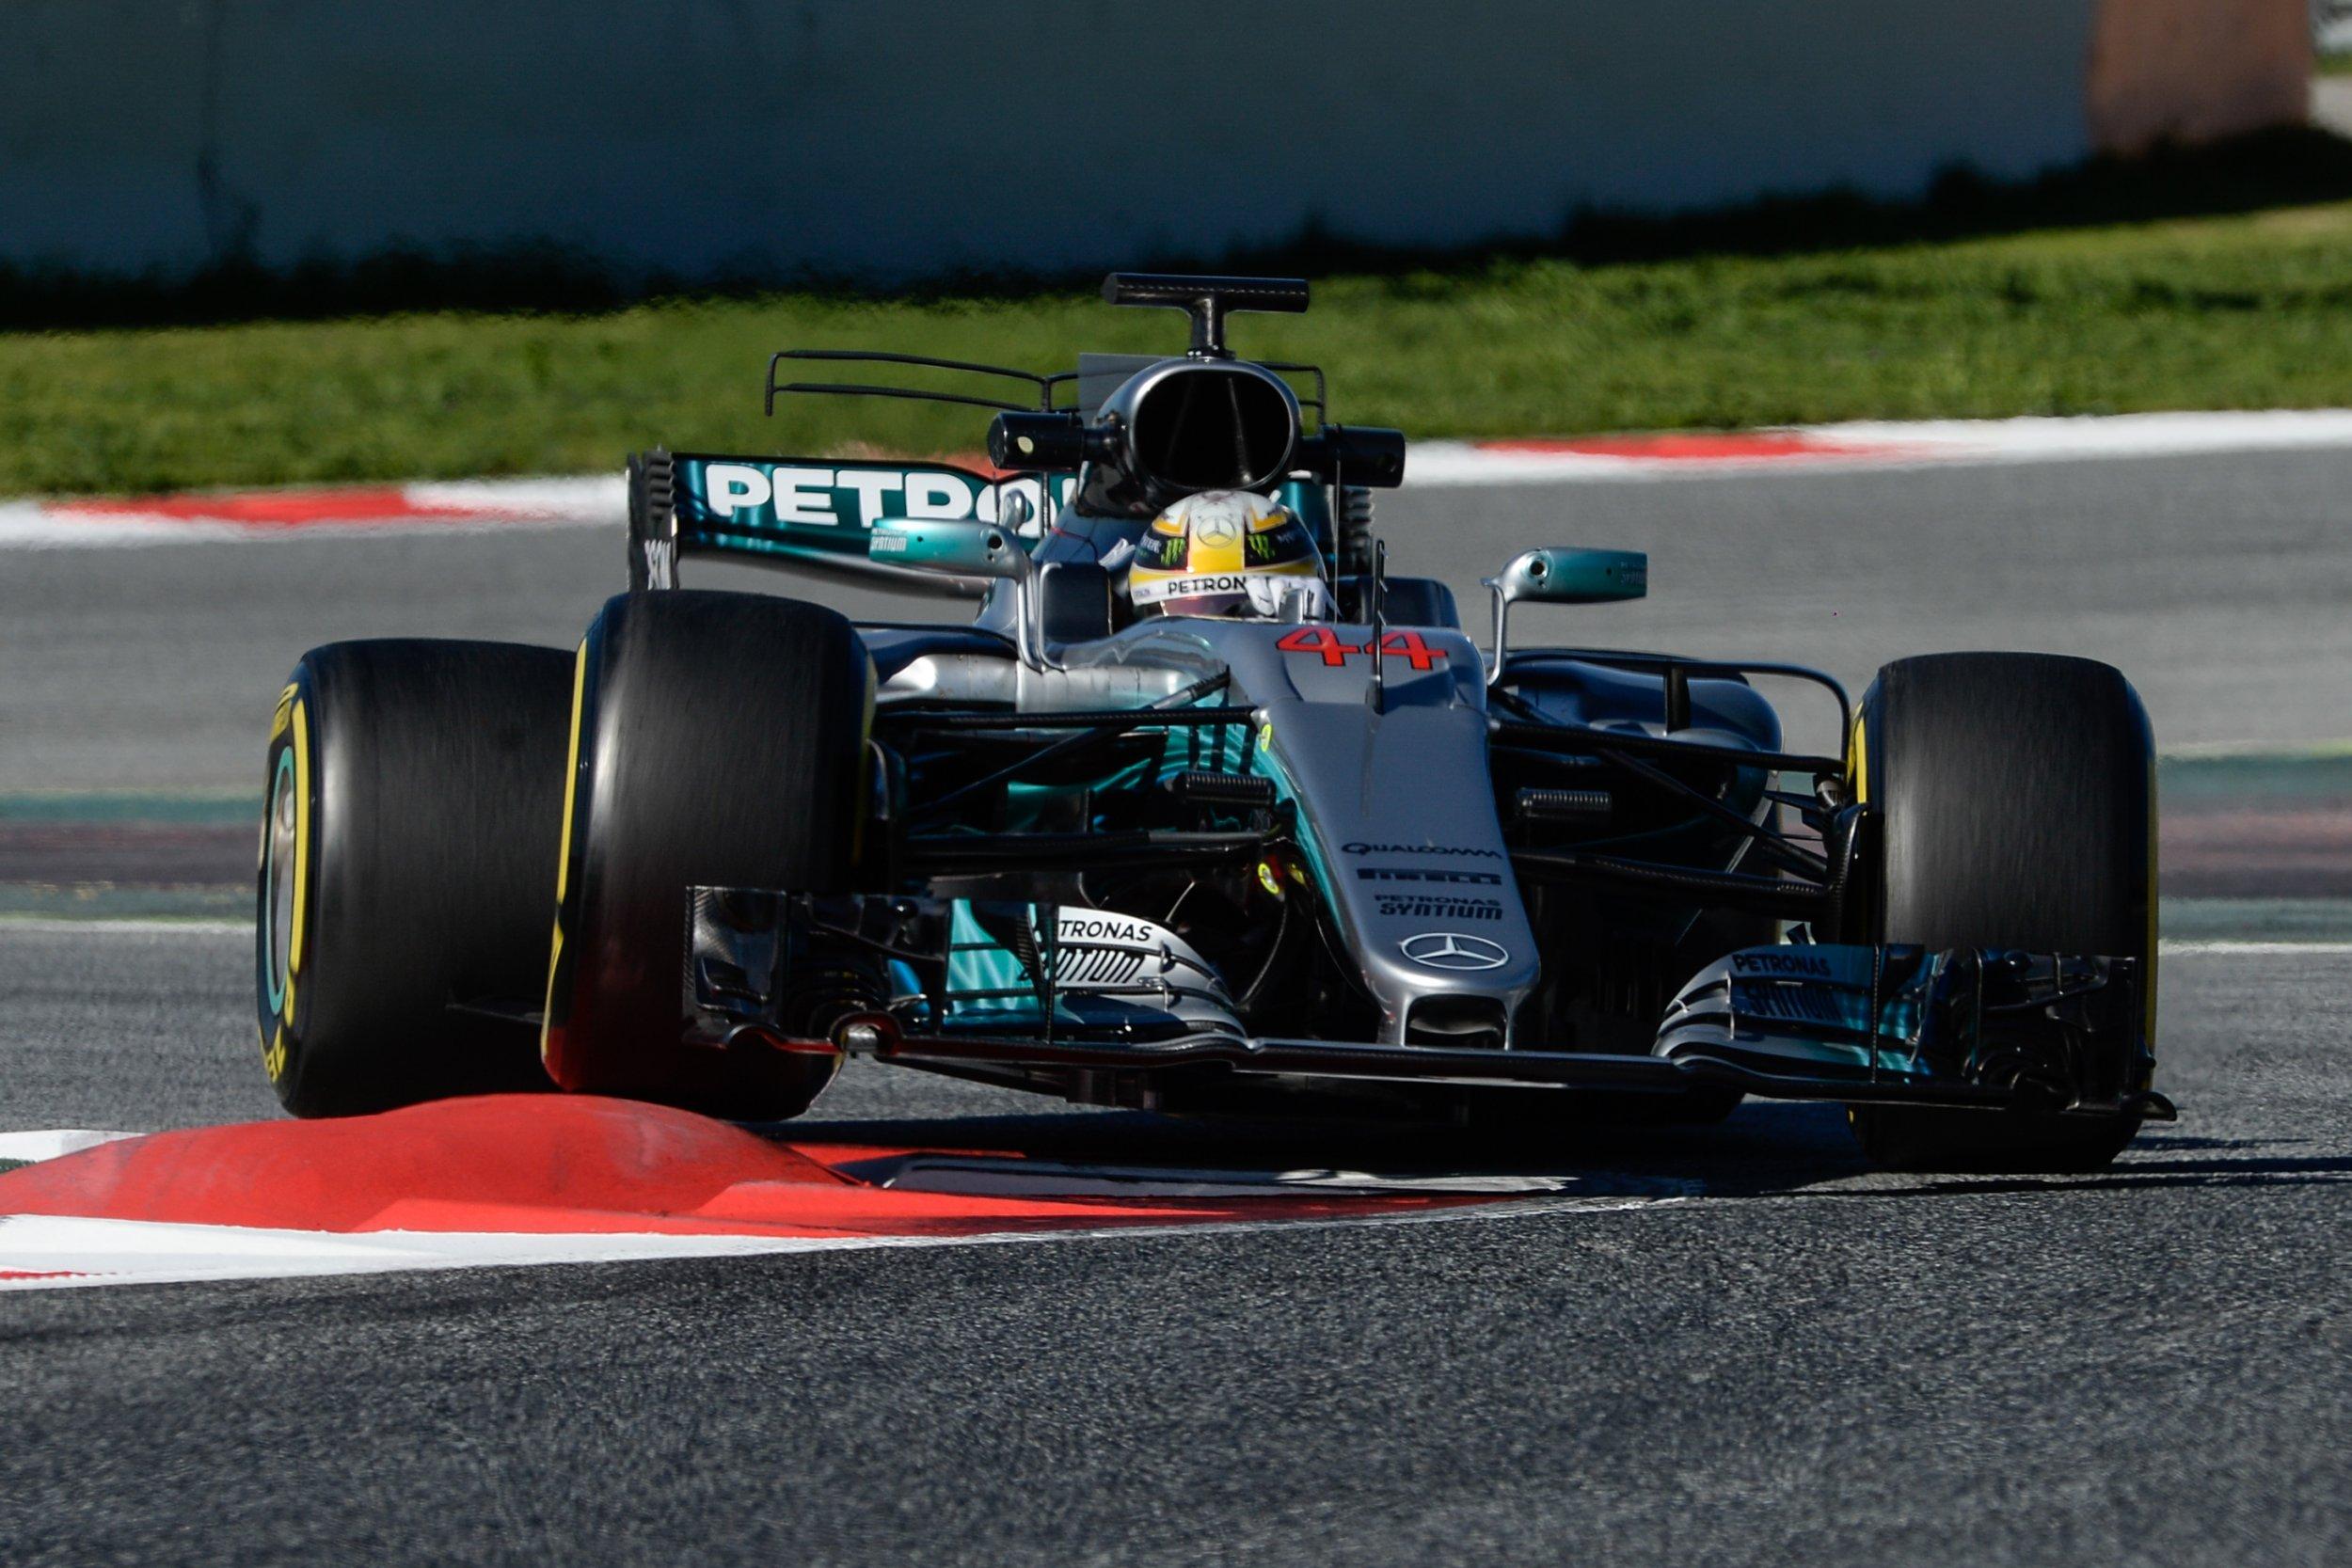 Lewis Hamilton Names Favorite For 2017 Formula One Season